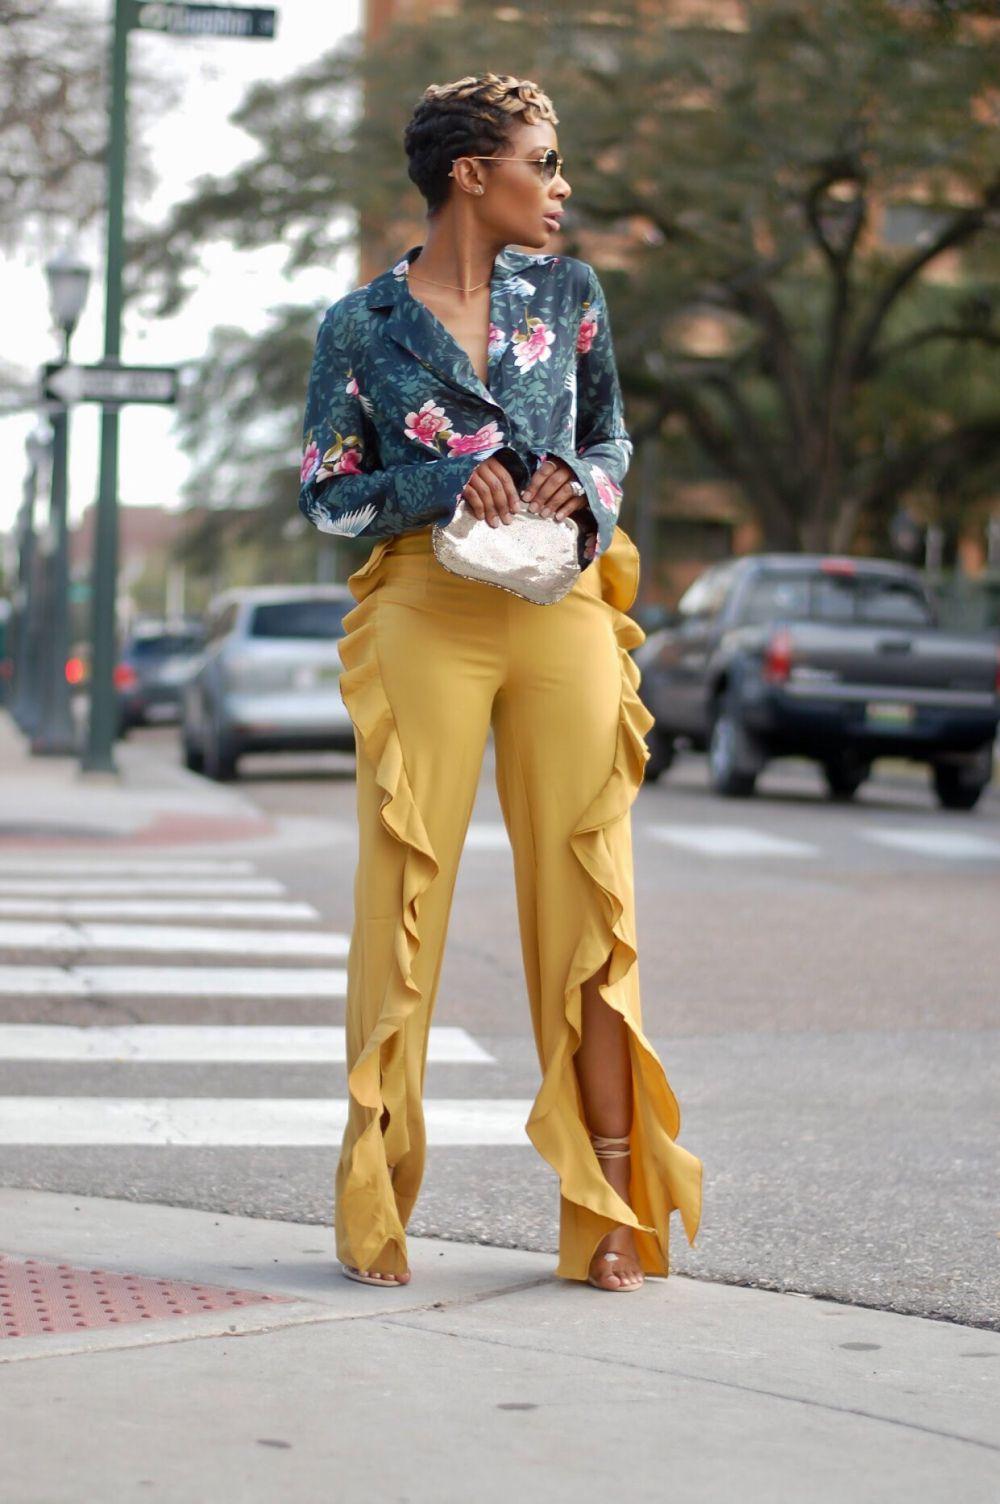 659a9722d It's GOLDEN ✨ | Diva Básico Chic | Spring 2018 fashion trends ...